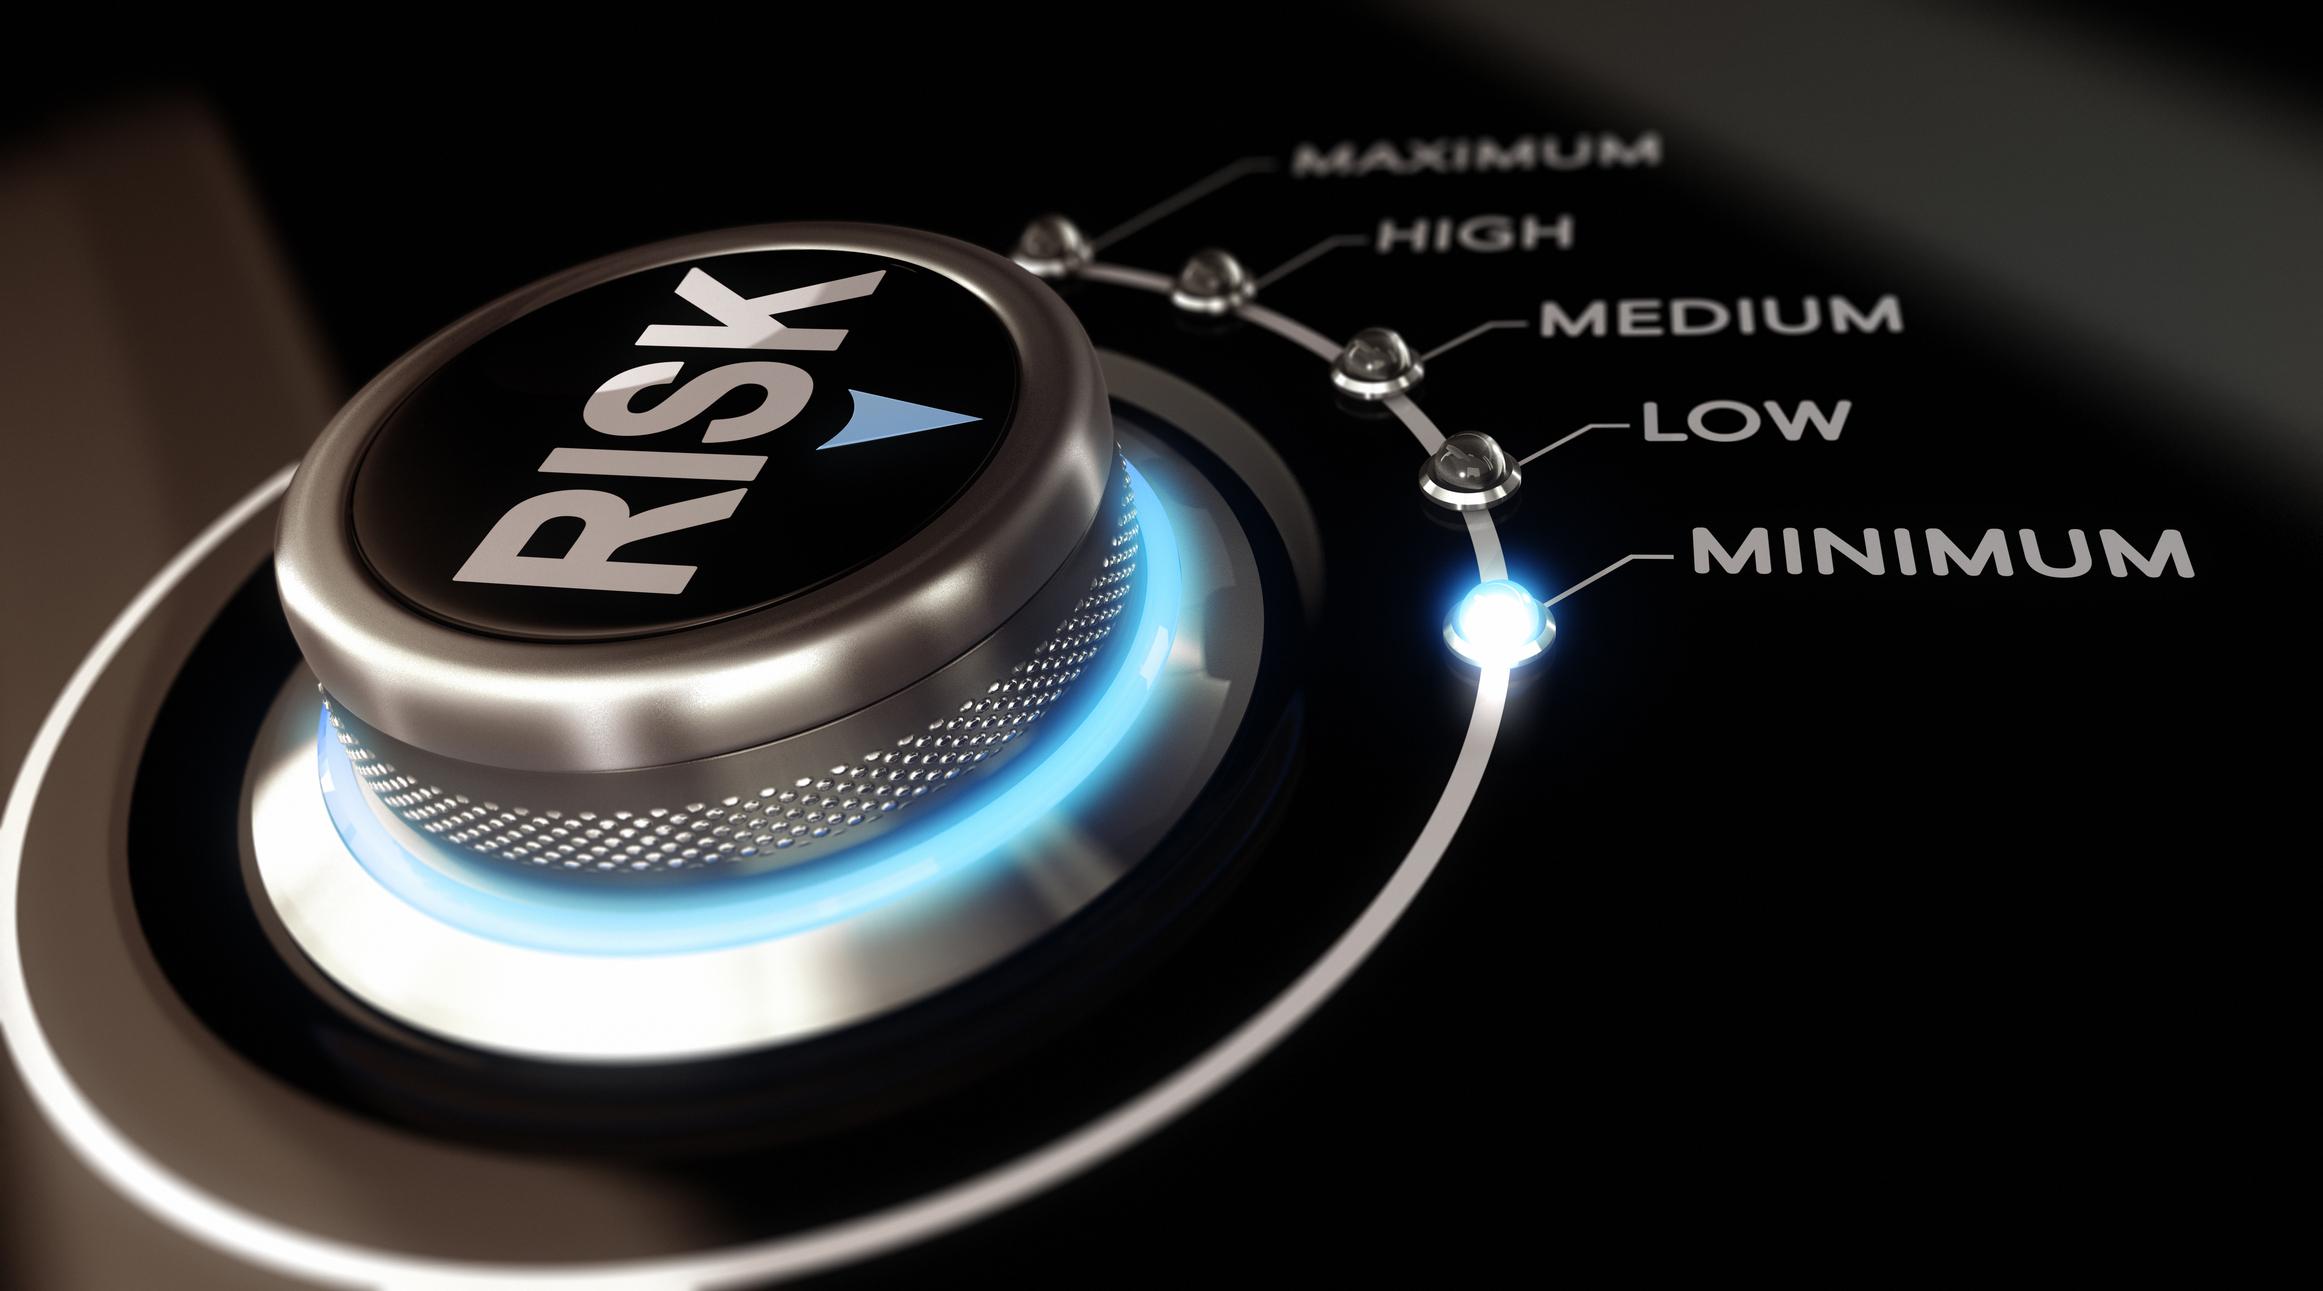 A dial measuring risk points towards minimum.